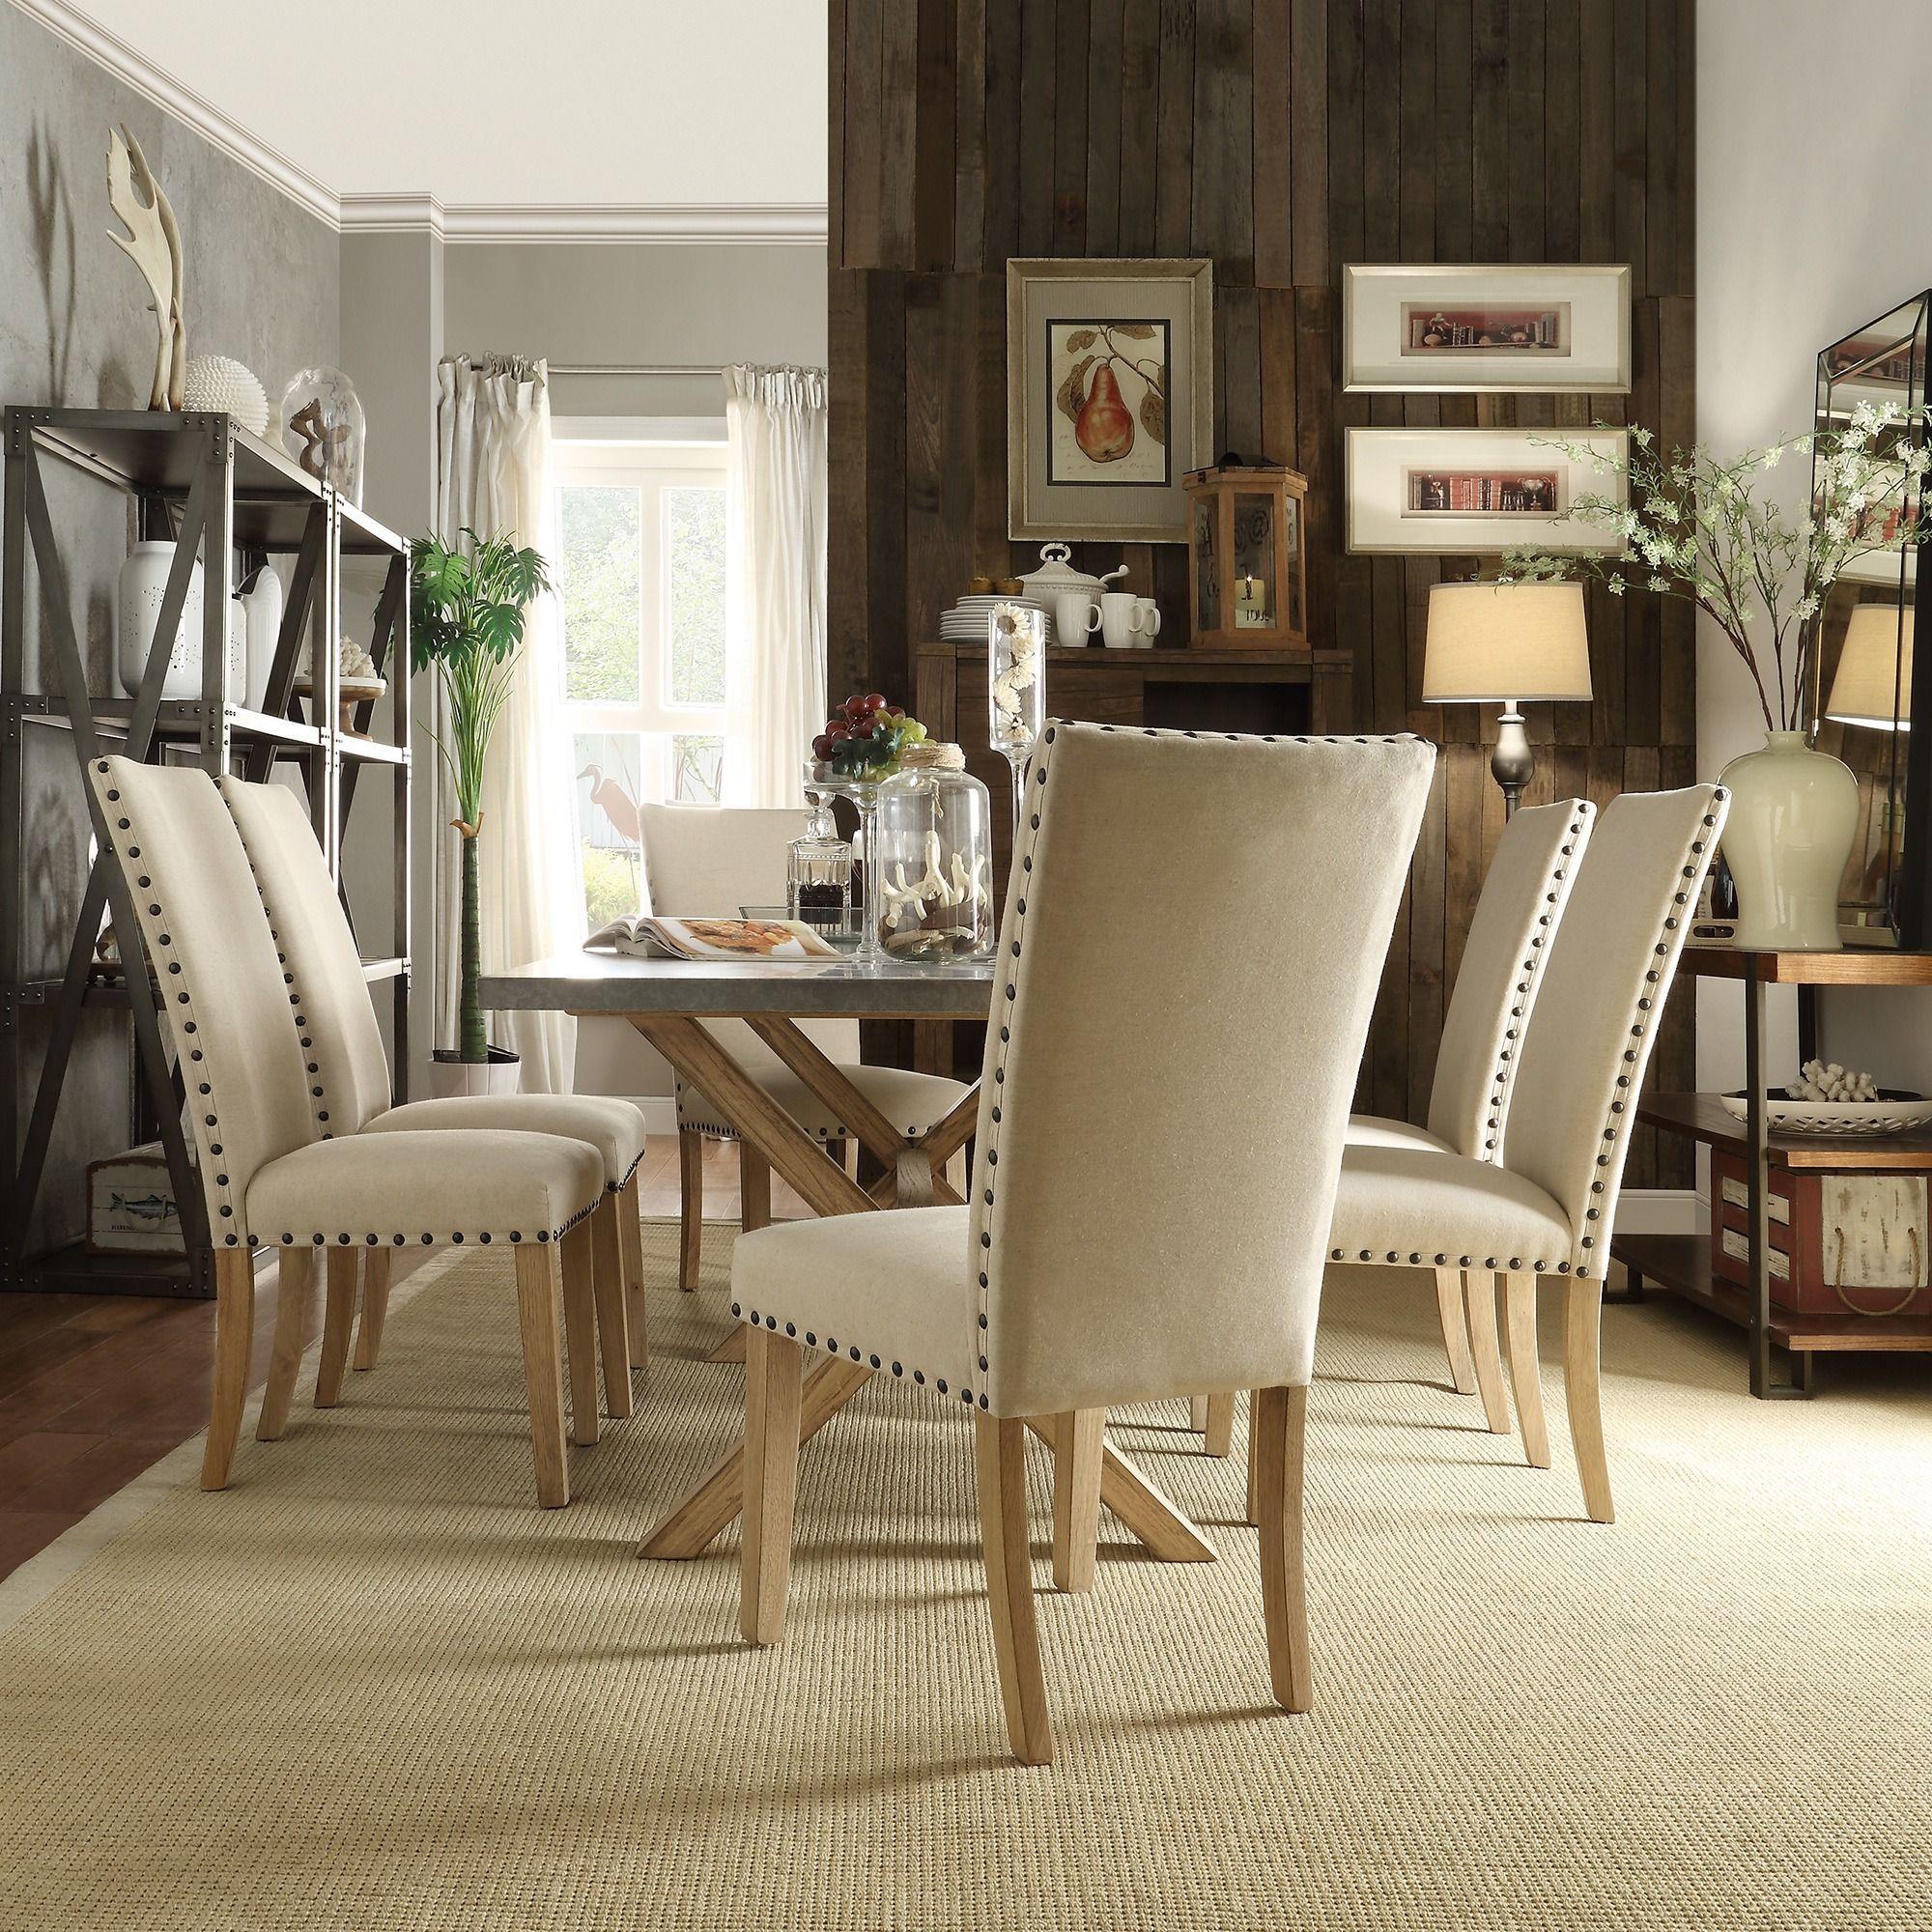 inspire q aberdeen industrial zinc top weathered oak trestle 7 piece dining set meubles en